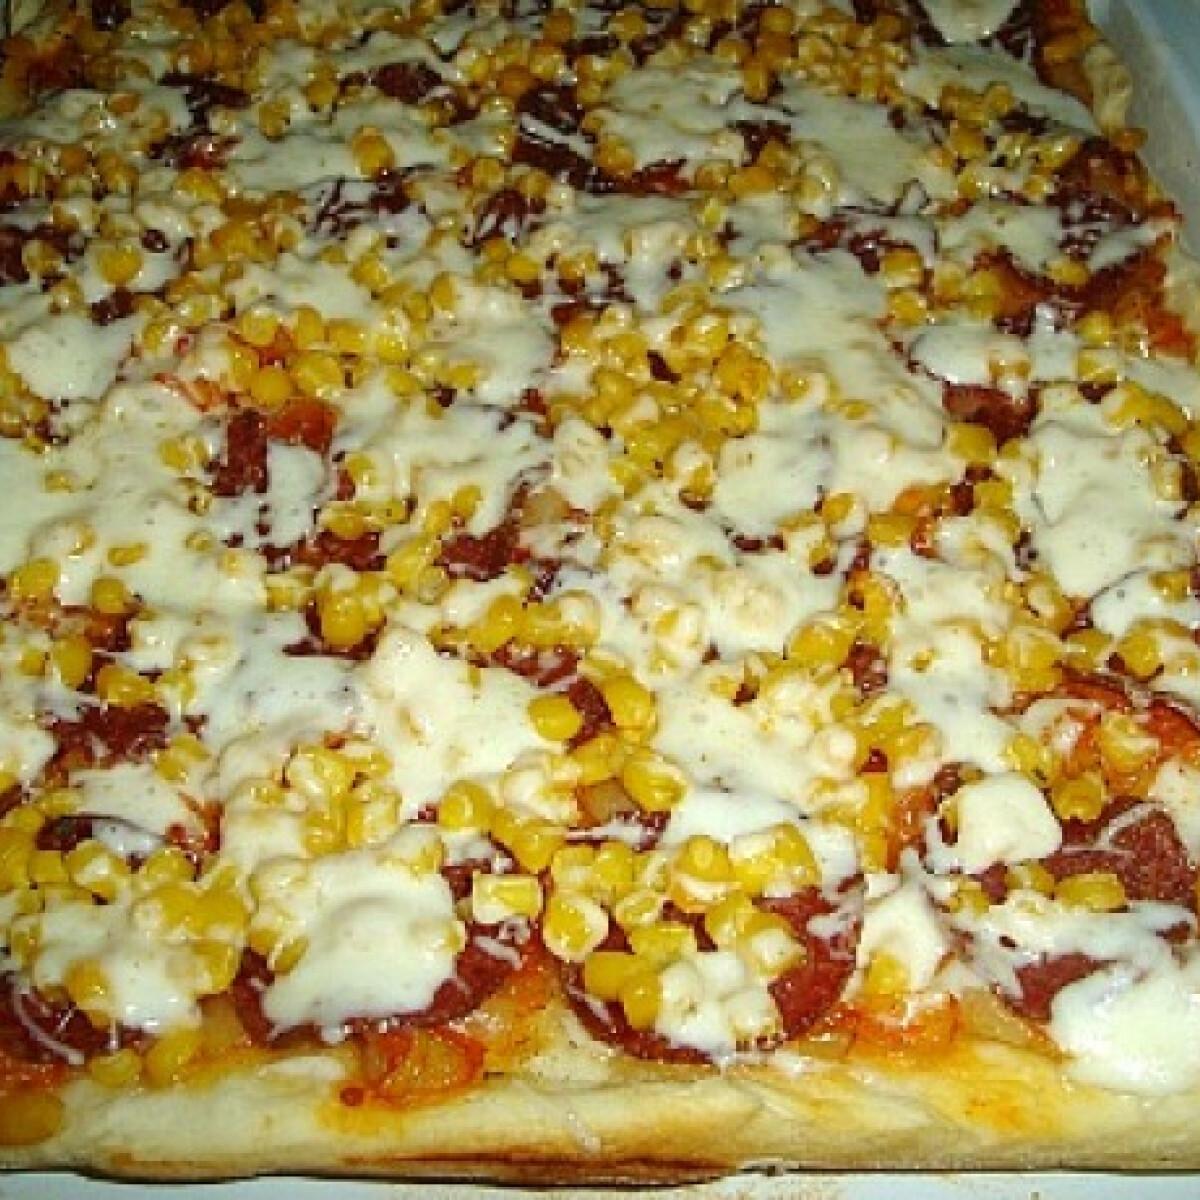 Lecsós pizza gazdagon